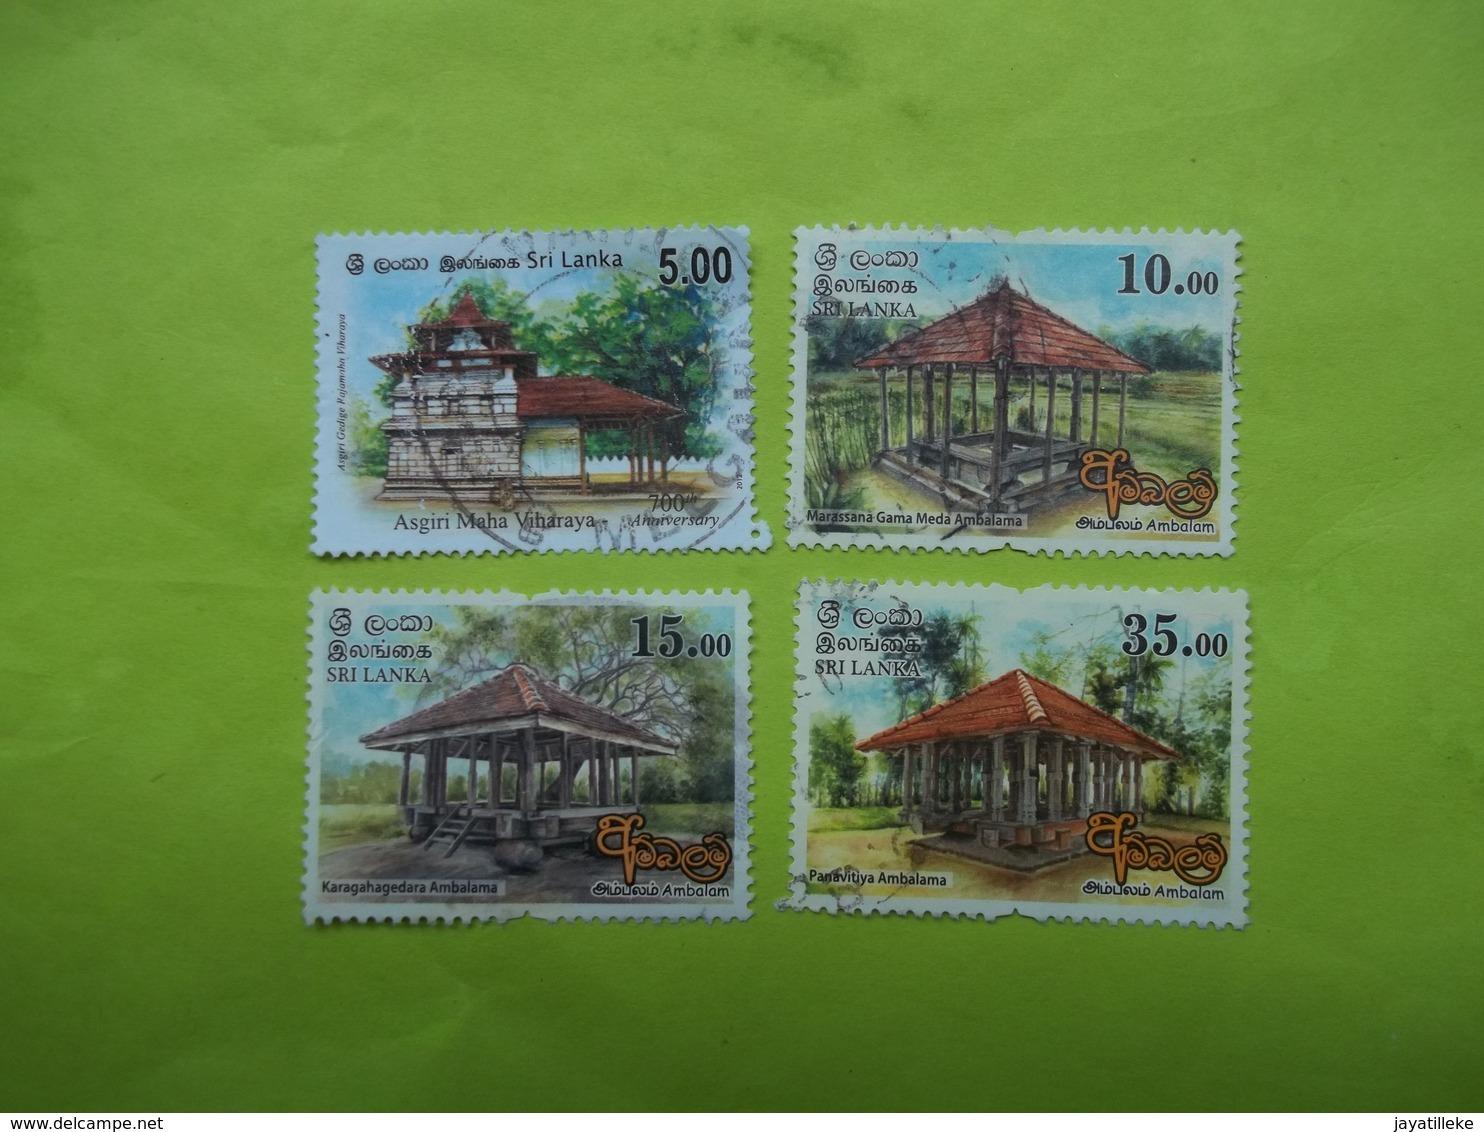 SRI LANKA (CEYLON)  - AMBALAM 2018 FULL SET USED. - Sri Lanka (Ceylon) (1948-...)